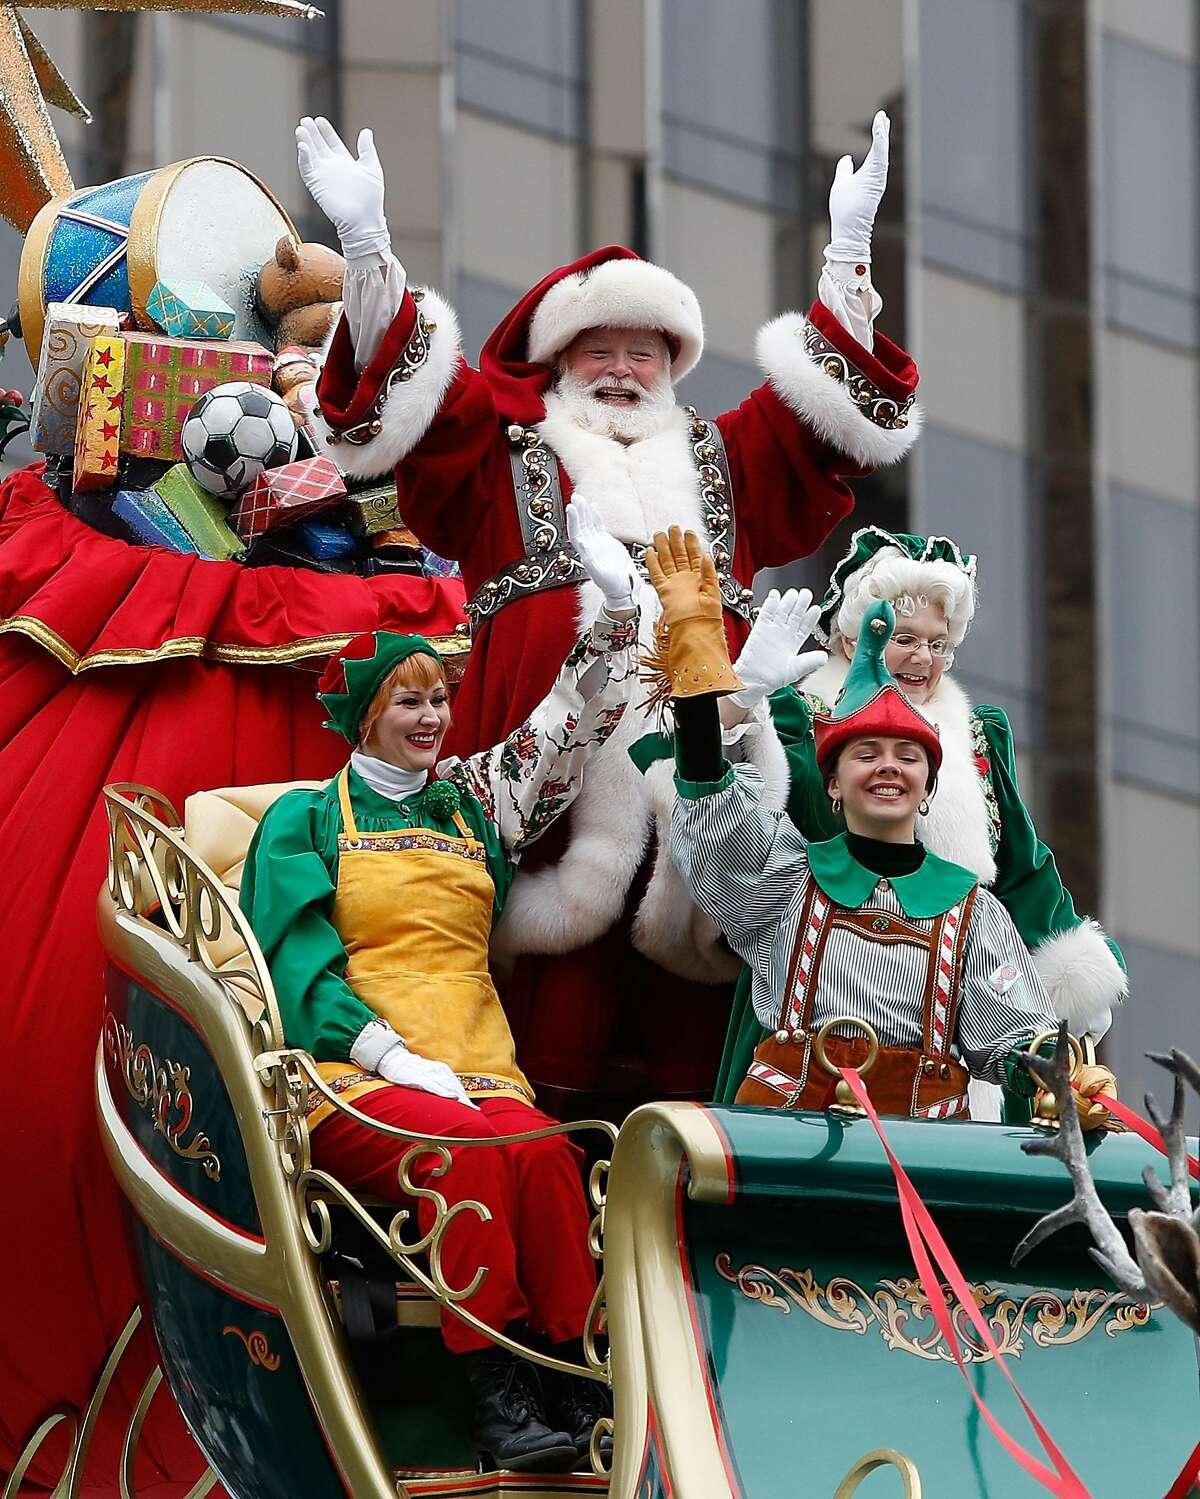 NEW YORK, NY - NOVEMBER 24: Santa Claus rides in Macy's Thanksgiving Day Parade on November 24, 2016 in New York City. (Photo by Taylor Hill/FilmMagic)